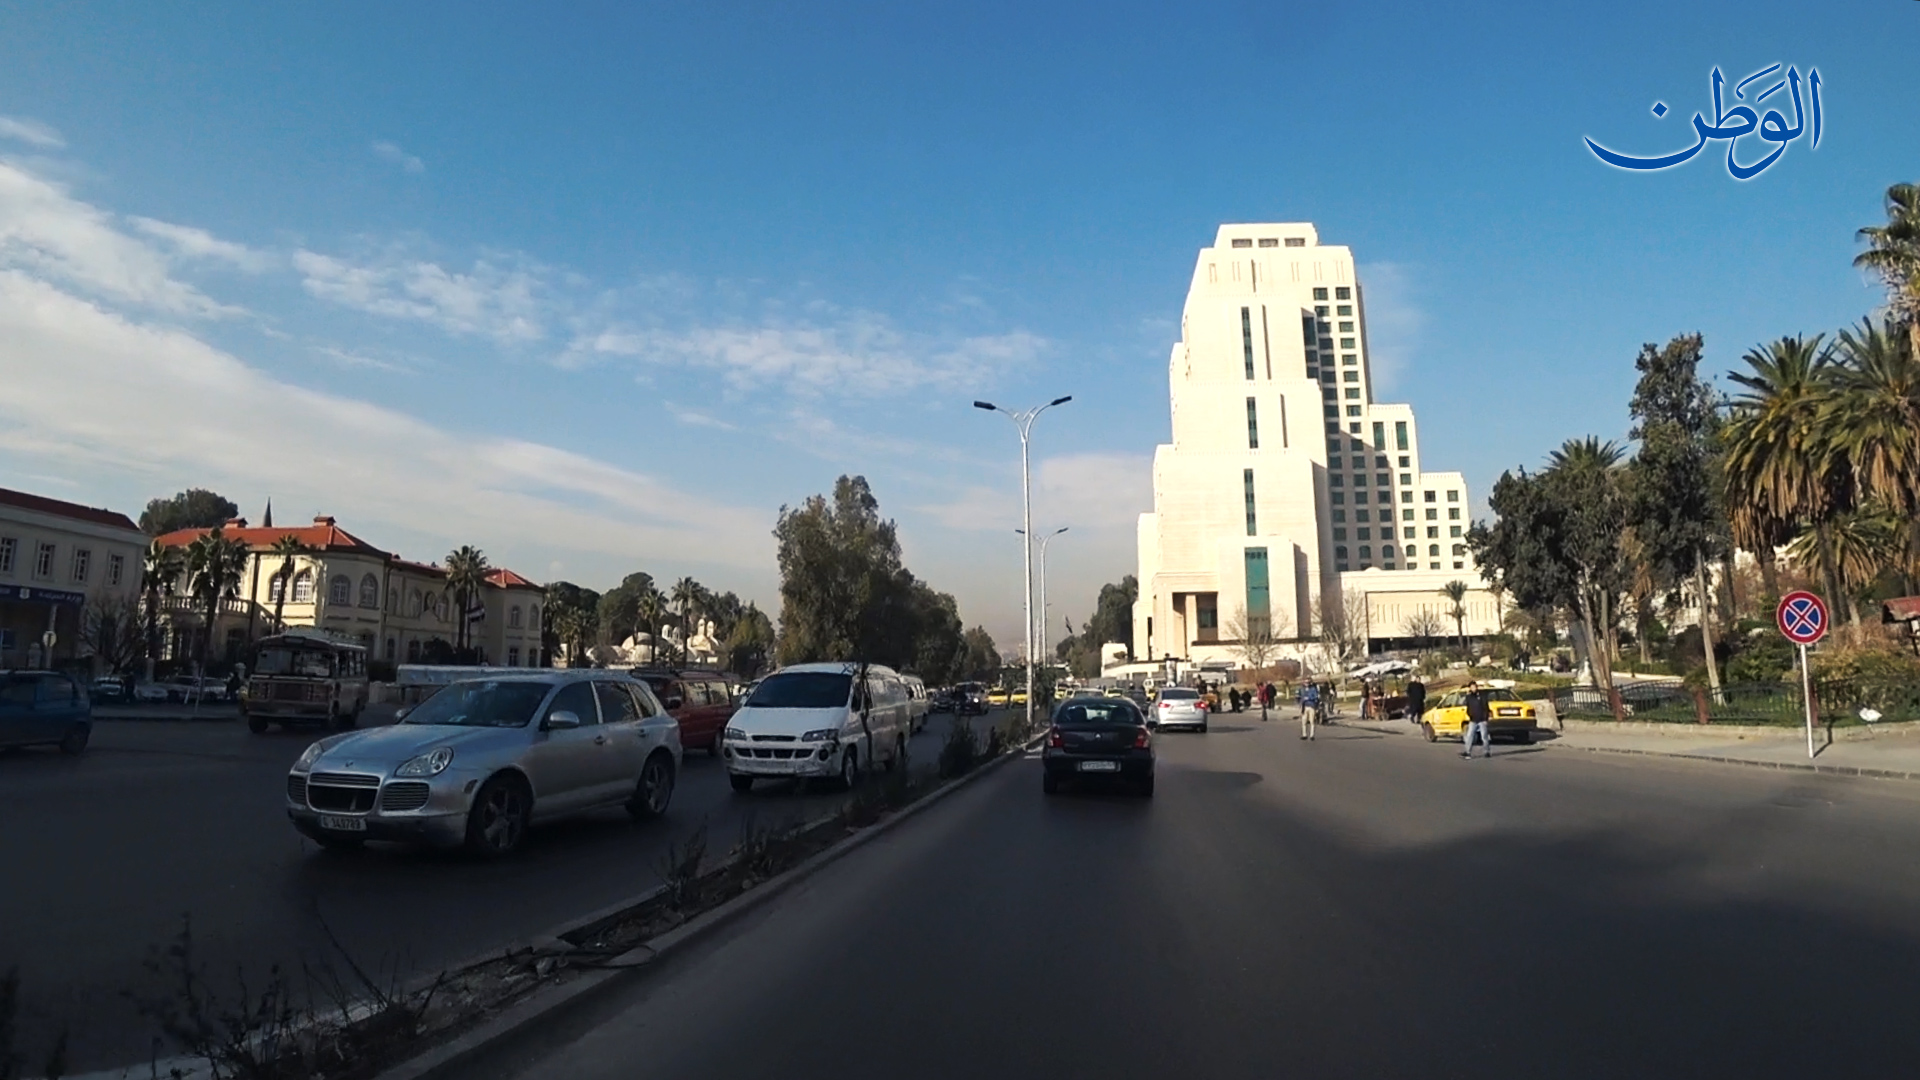 Photo of صباح دمشق بعد التصدي للعدوان الإسرائيلي فجراً || 21-1-2019